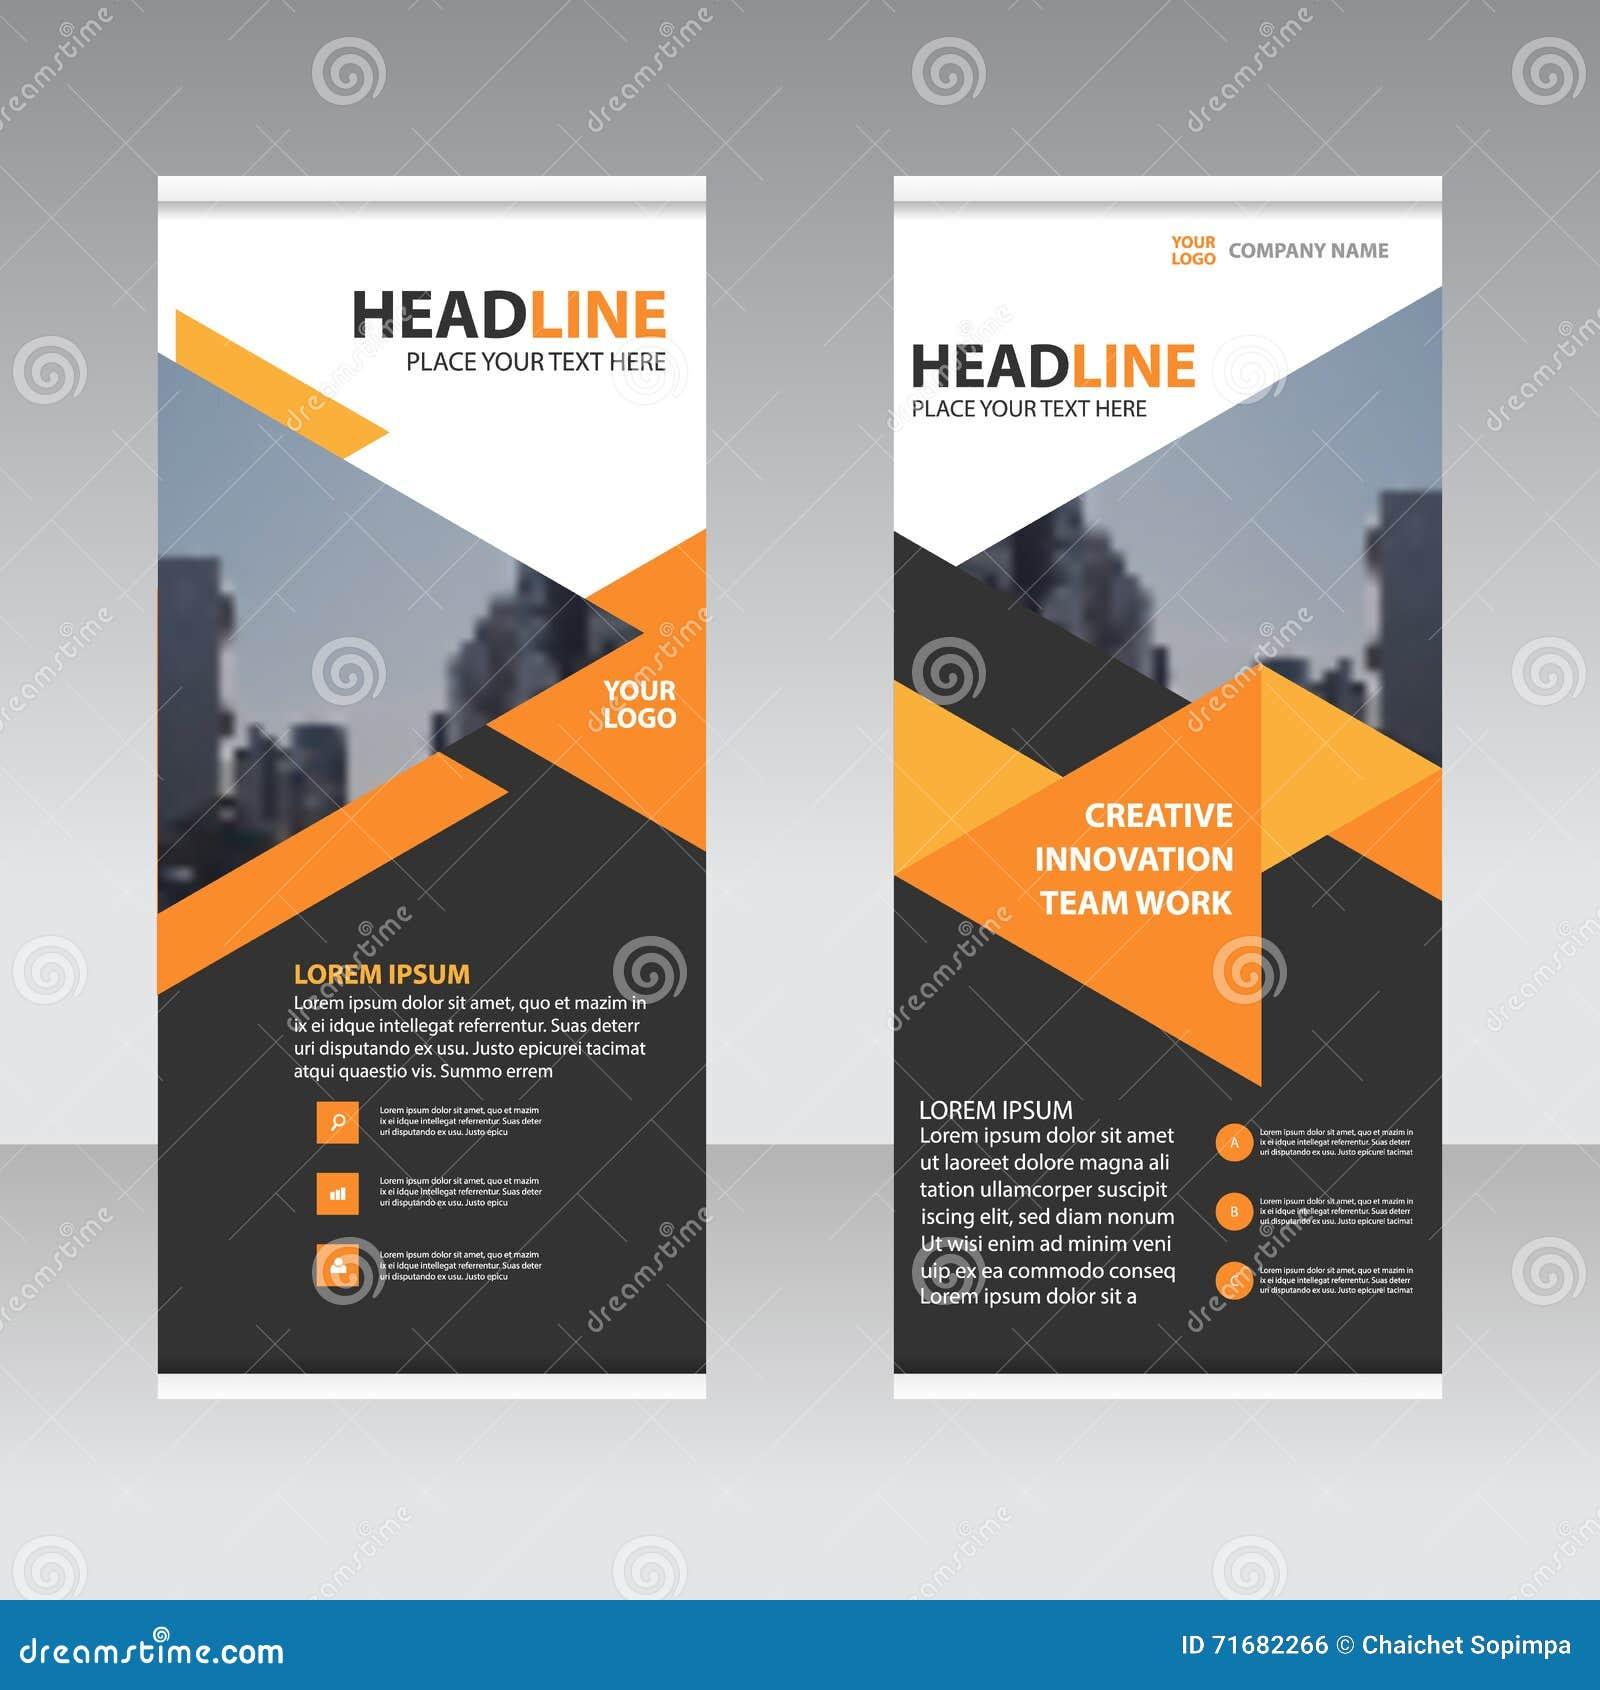 Design for roll up banner - Abstract Banner Business Design Flat Illustration Roll